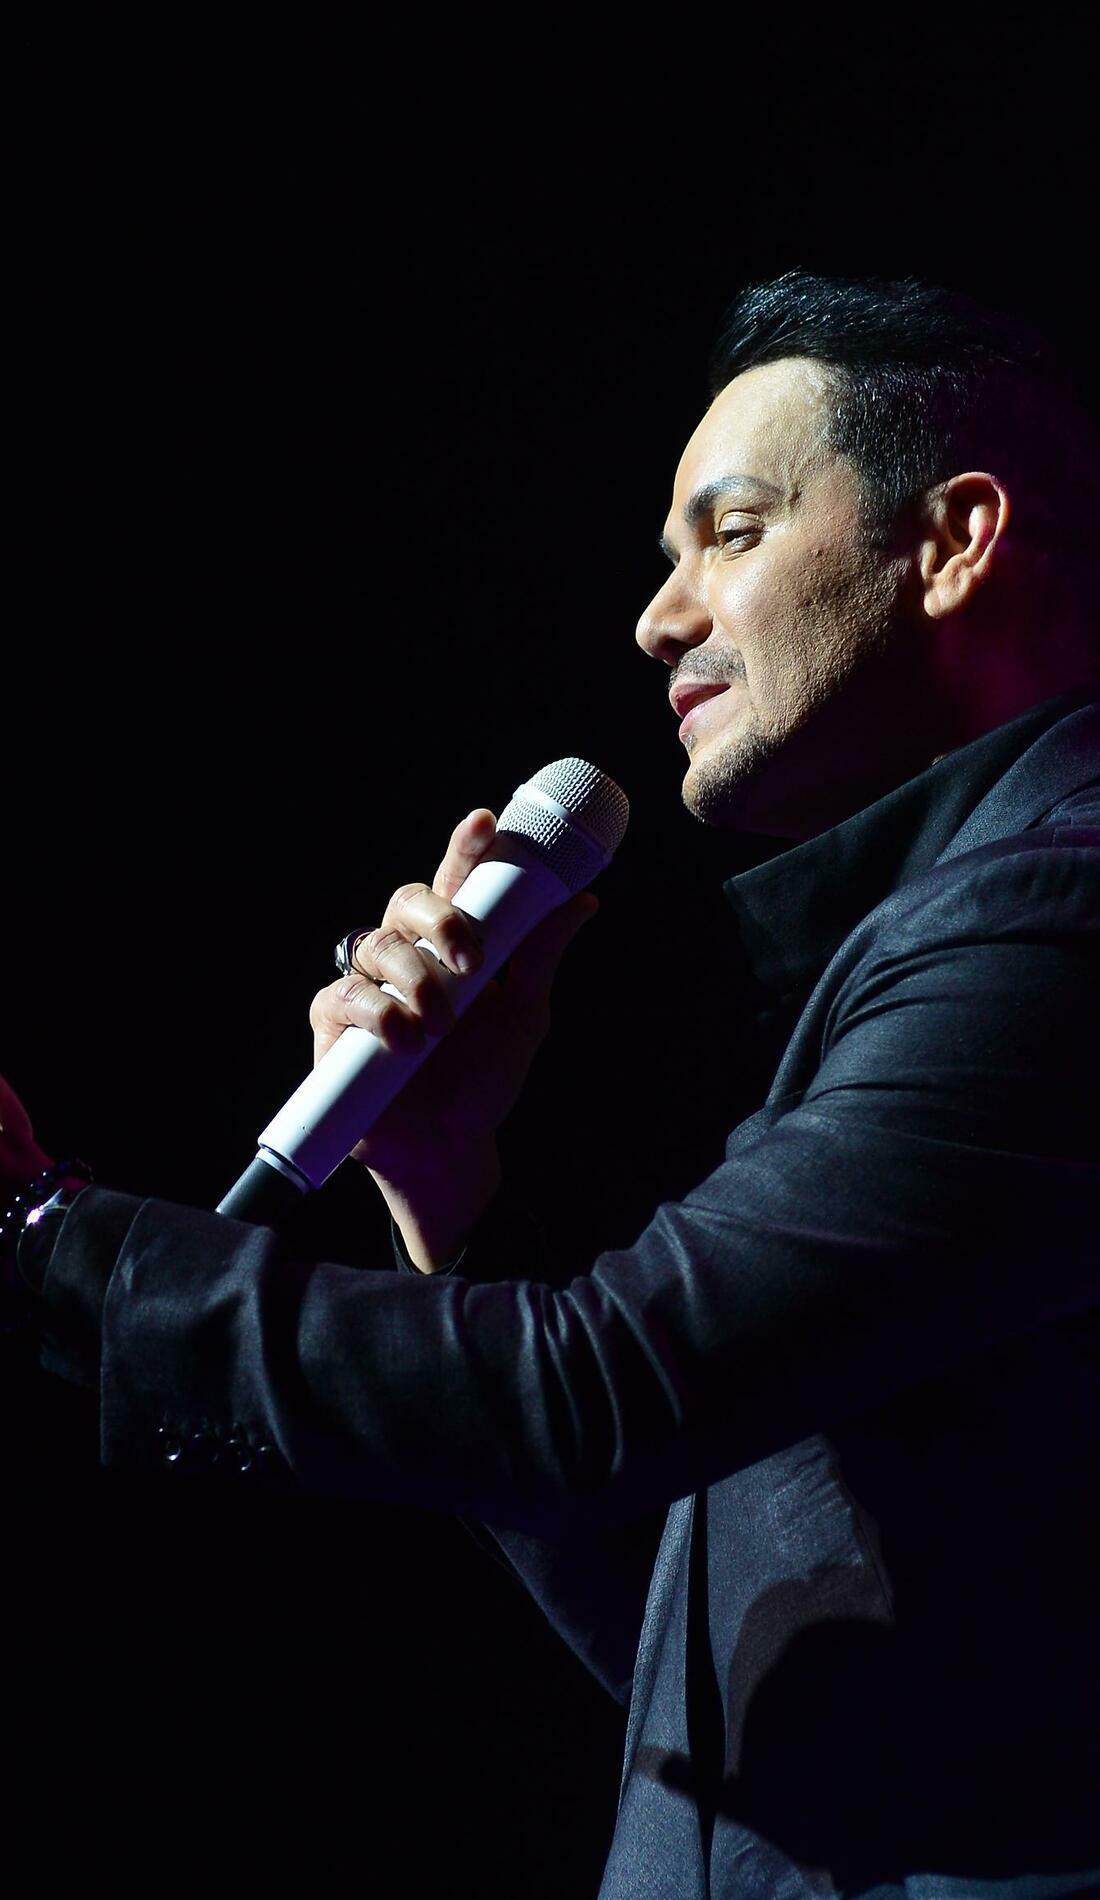 A Victor Manuelle live event